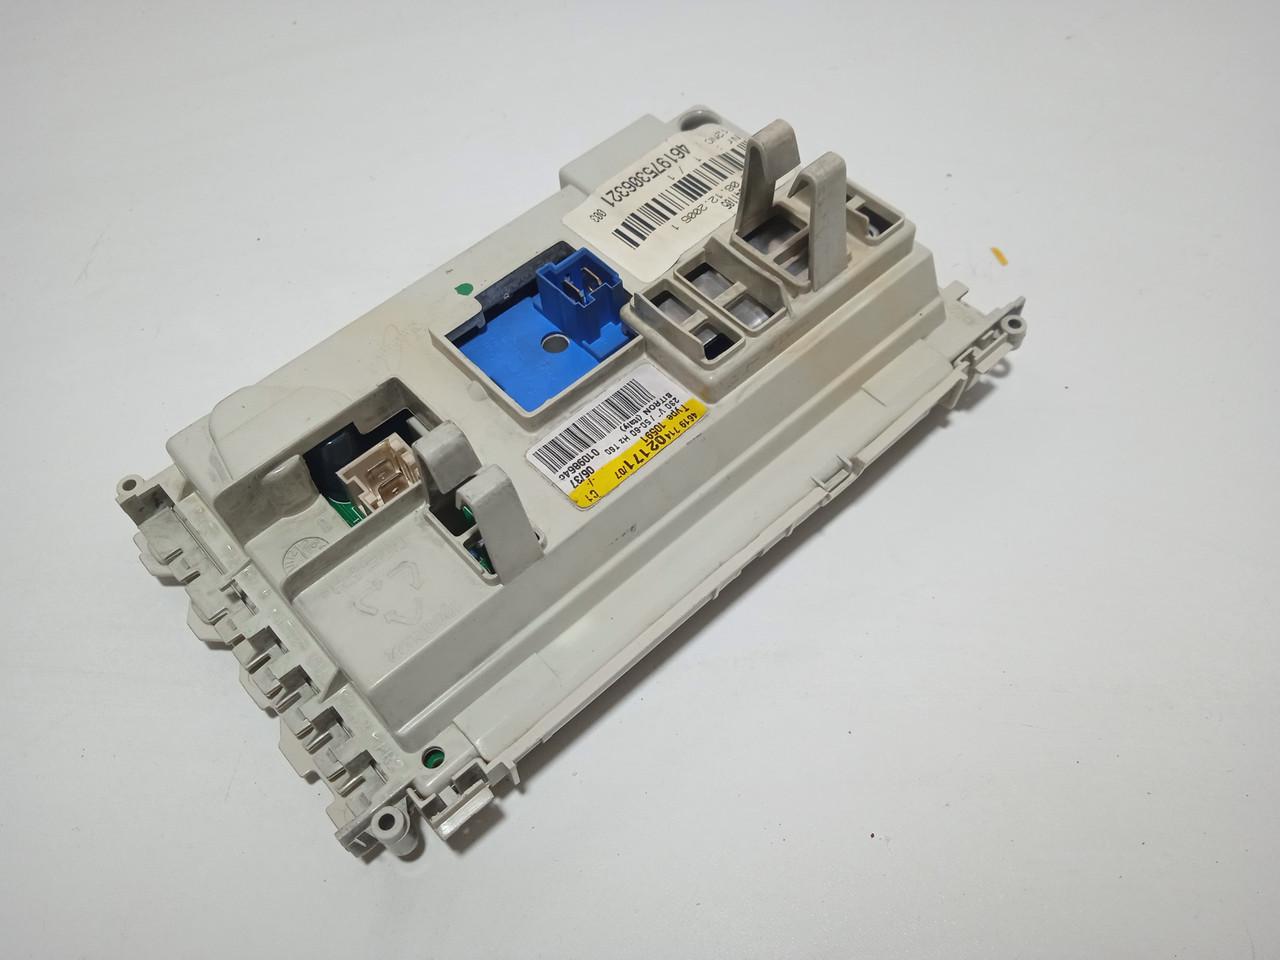 Модуль управления  Whirlpool AWO/D41105. 461975306321  Б/У